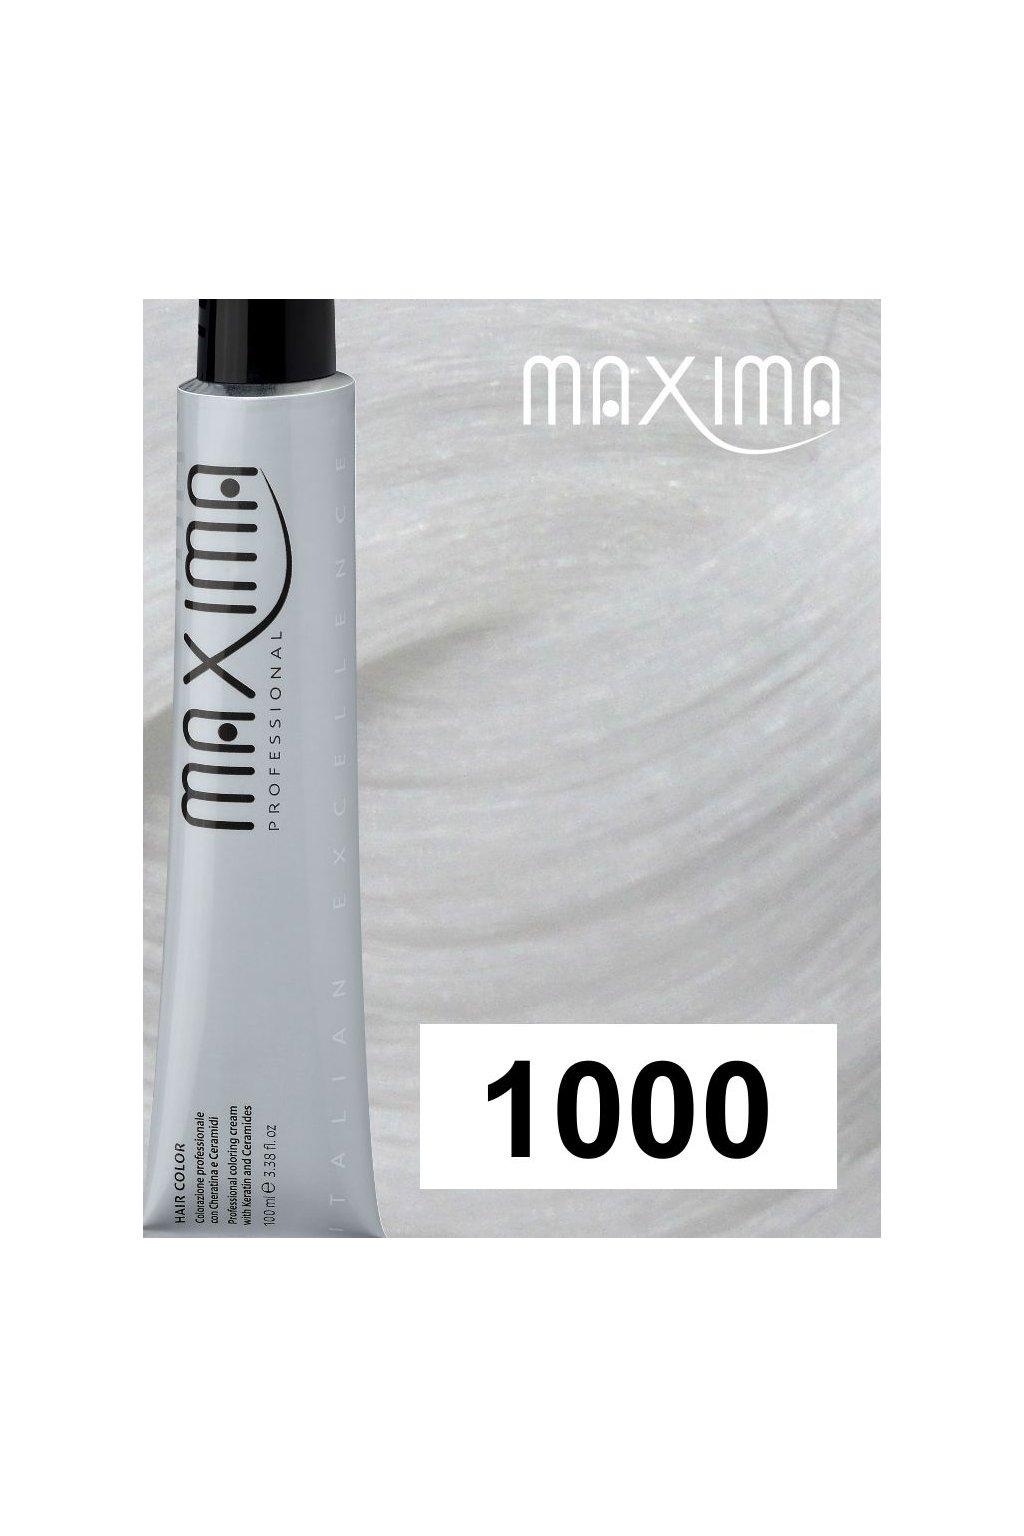 1000 max